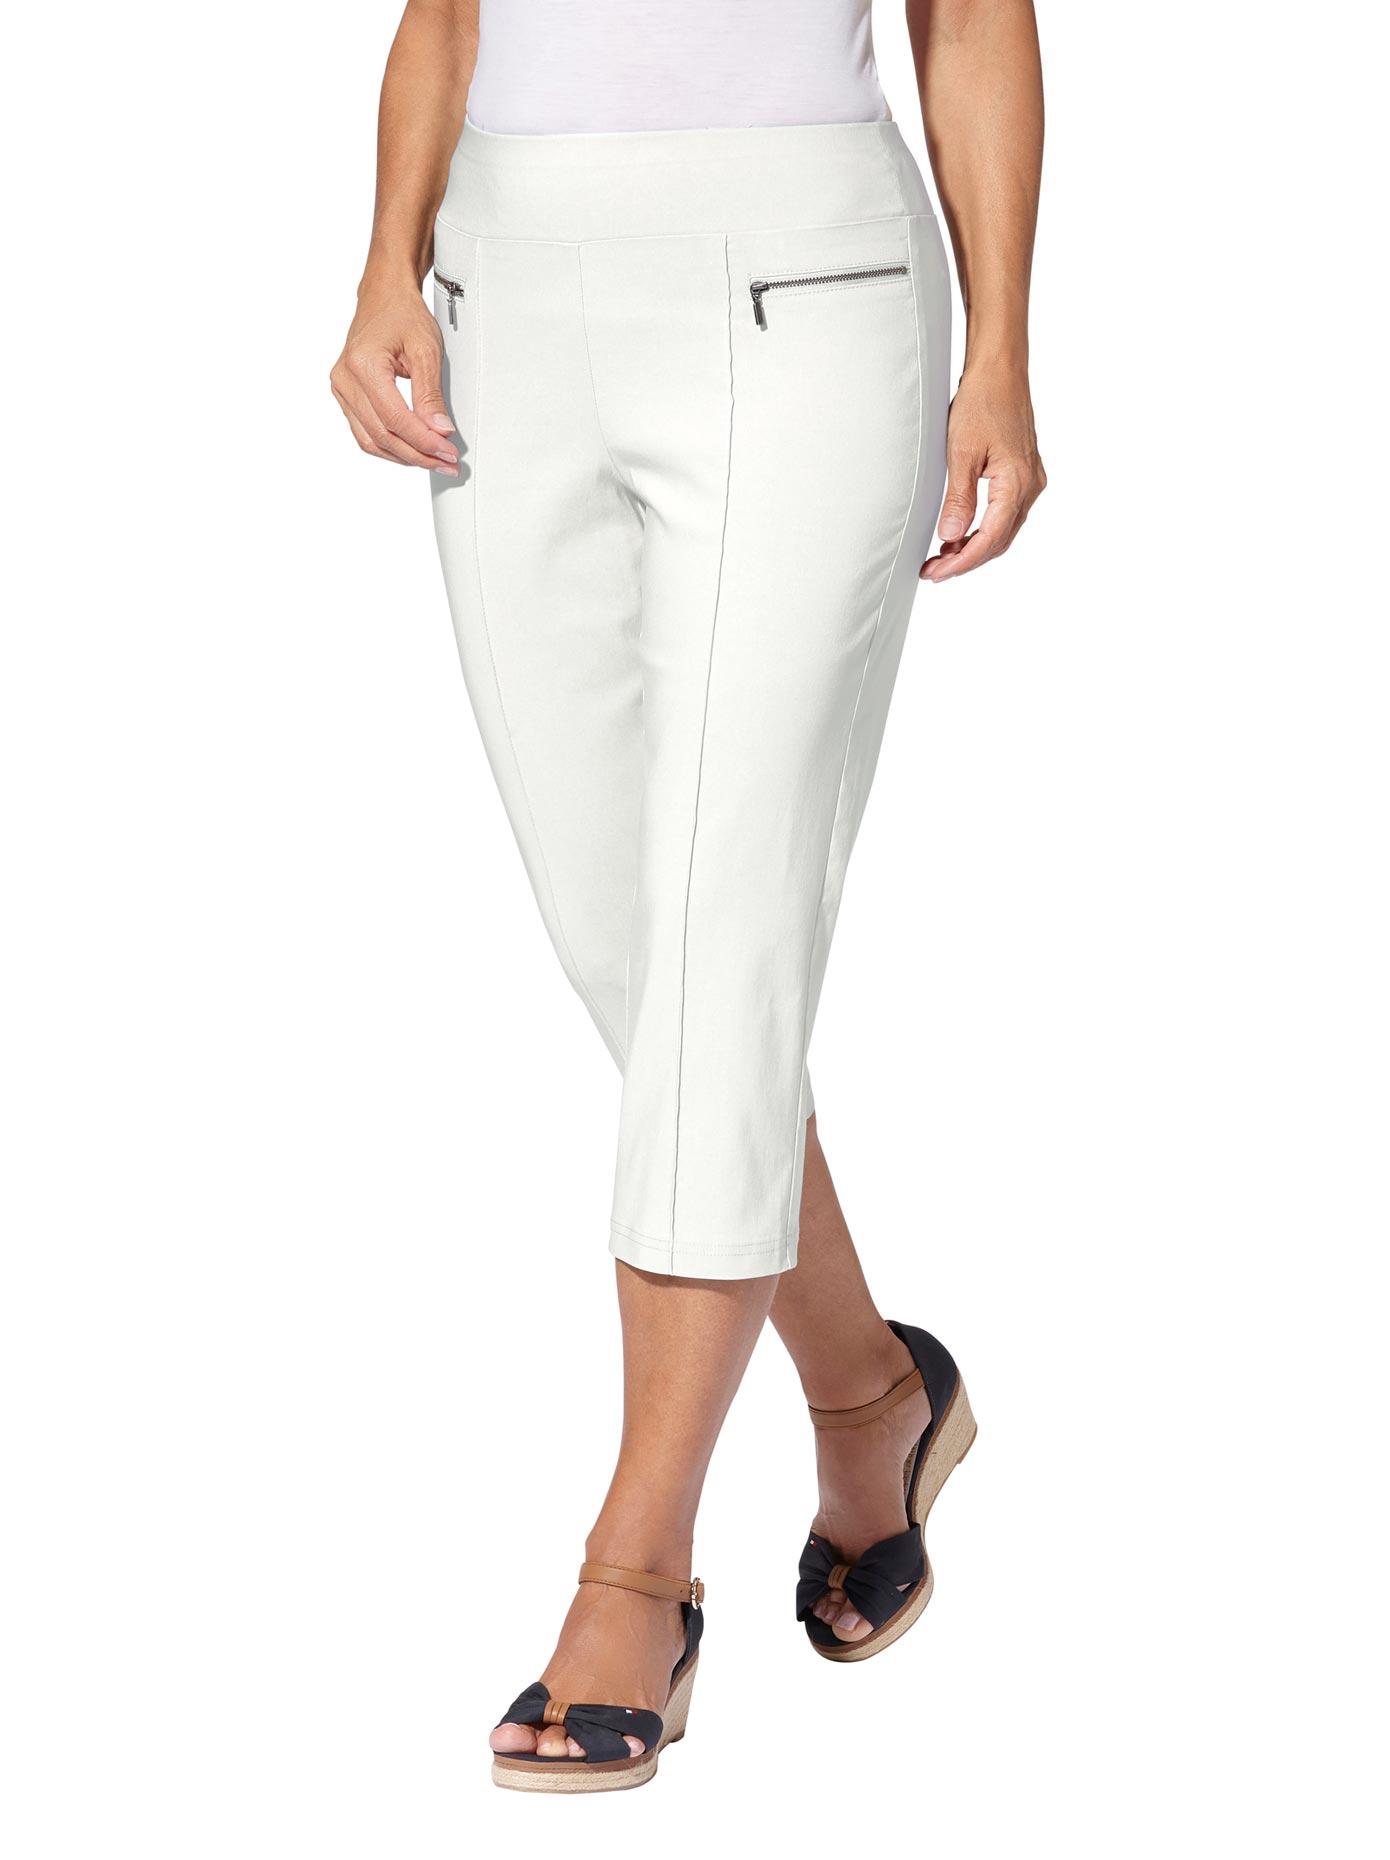 Casual Looks Capri-Hose in hochwertiger Bengalin-Qualität | Bekleidung > Hosen > Caprihosen | Beige | Casual Looks